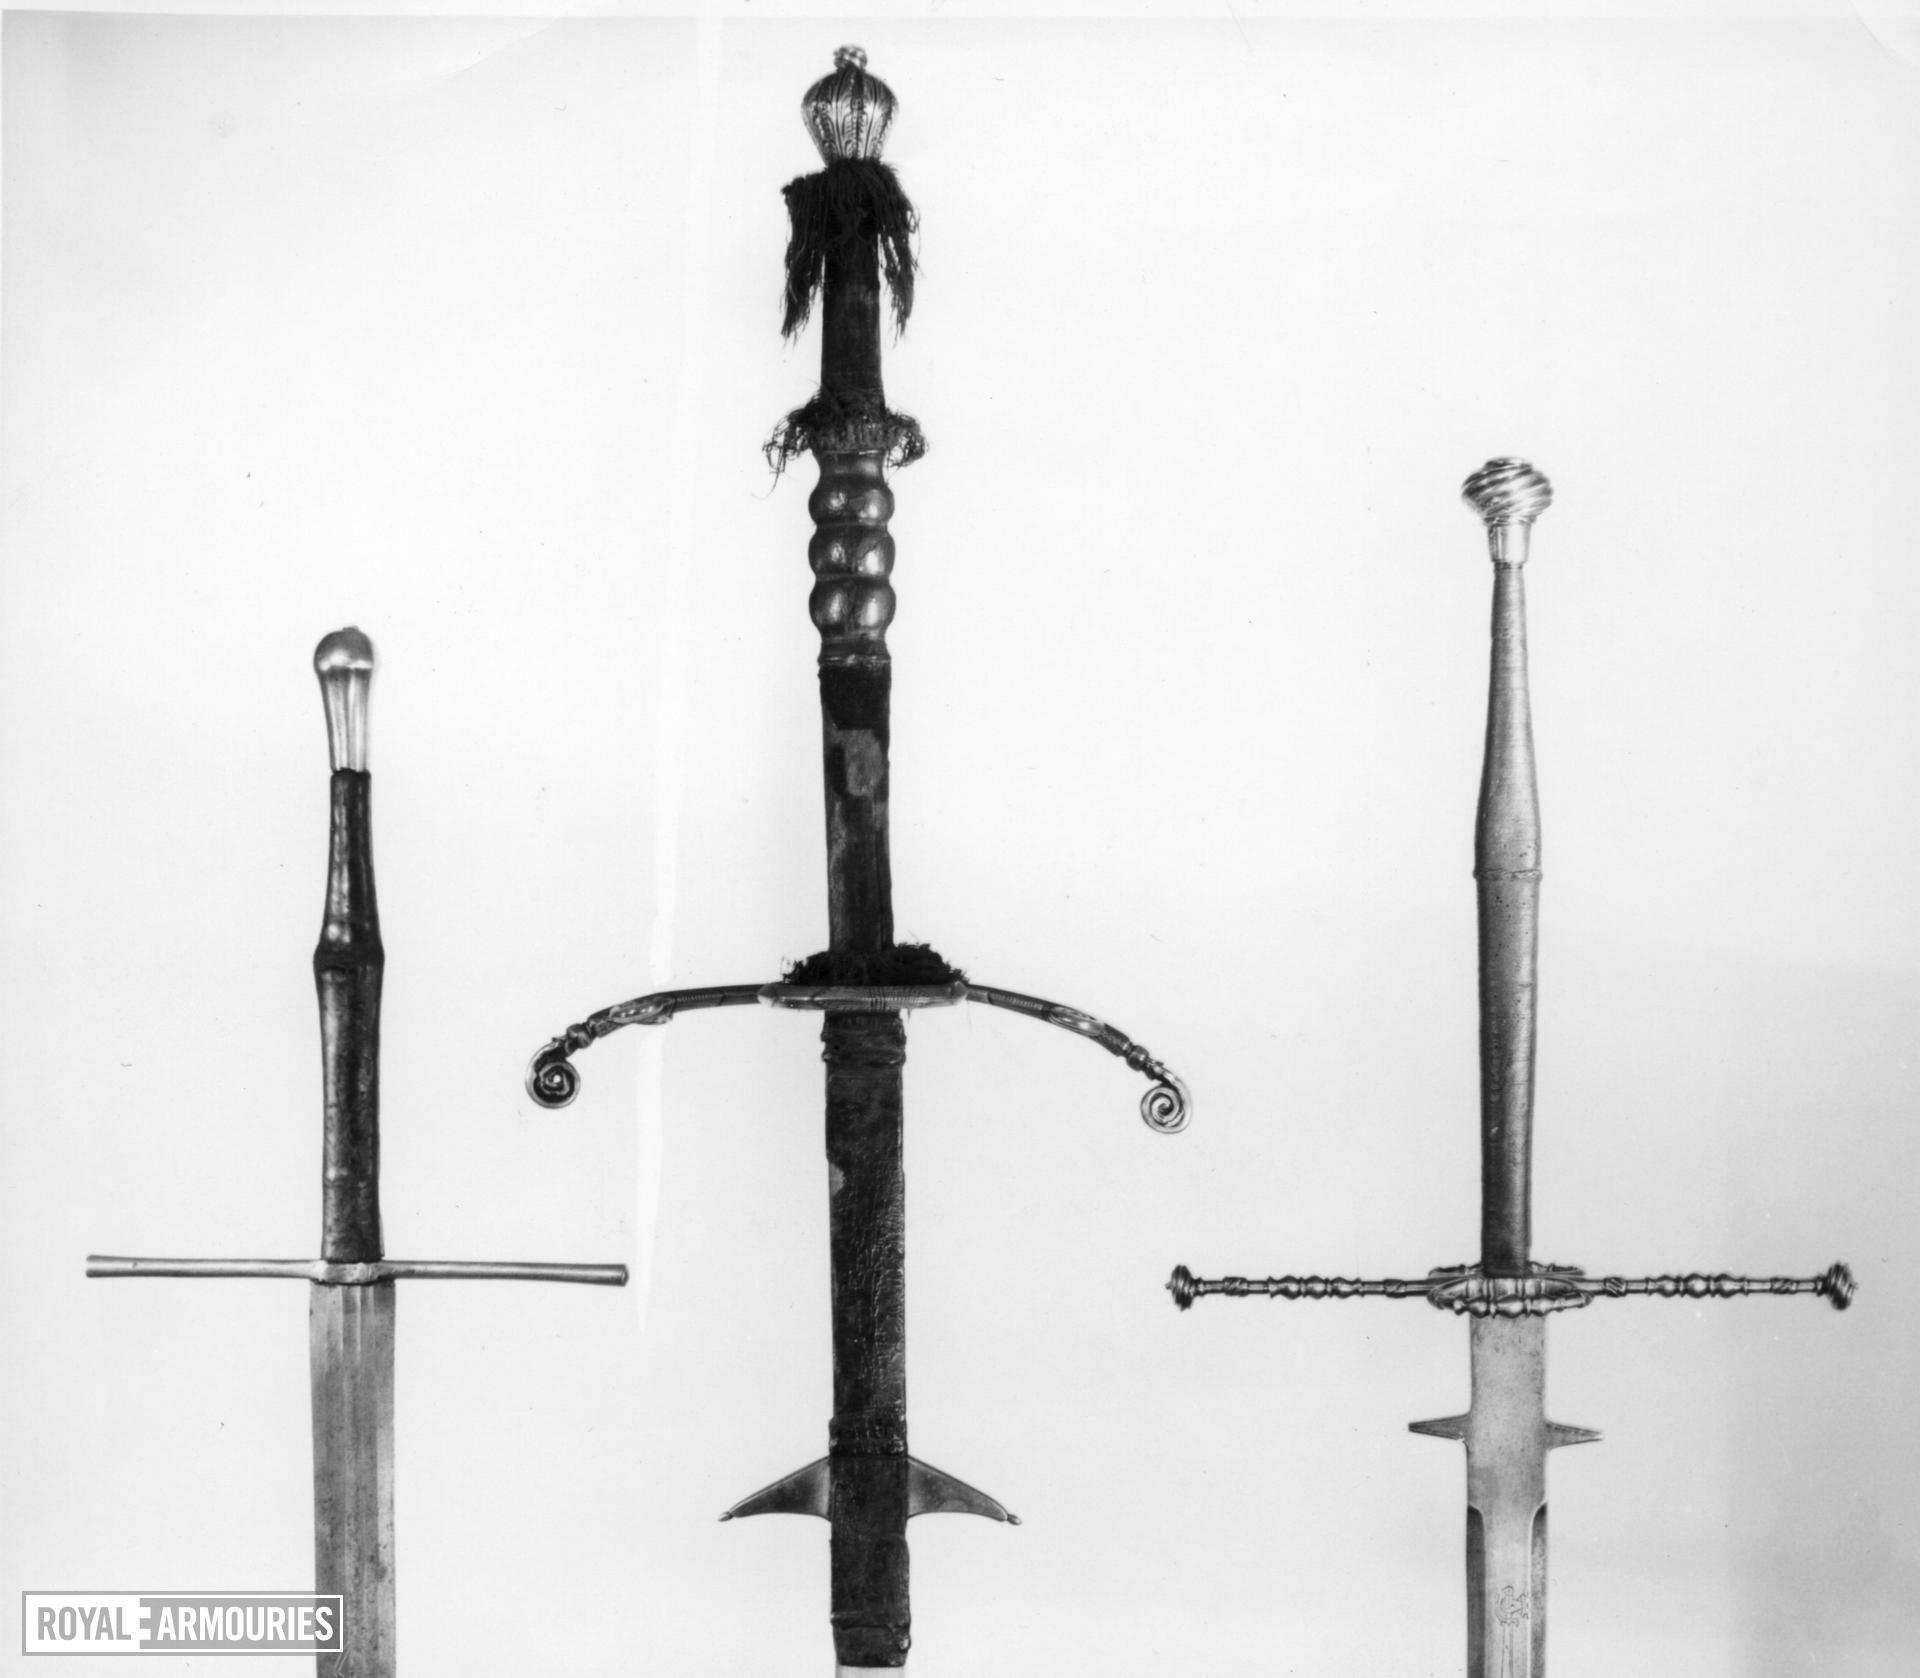 Sword - Two-hand sword Two-hand sword